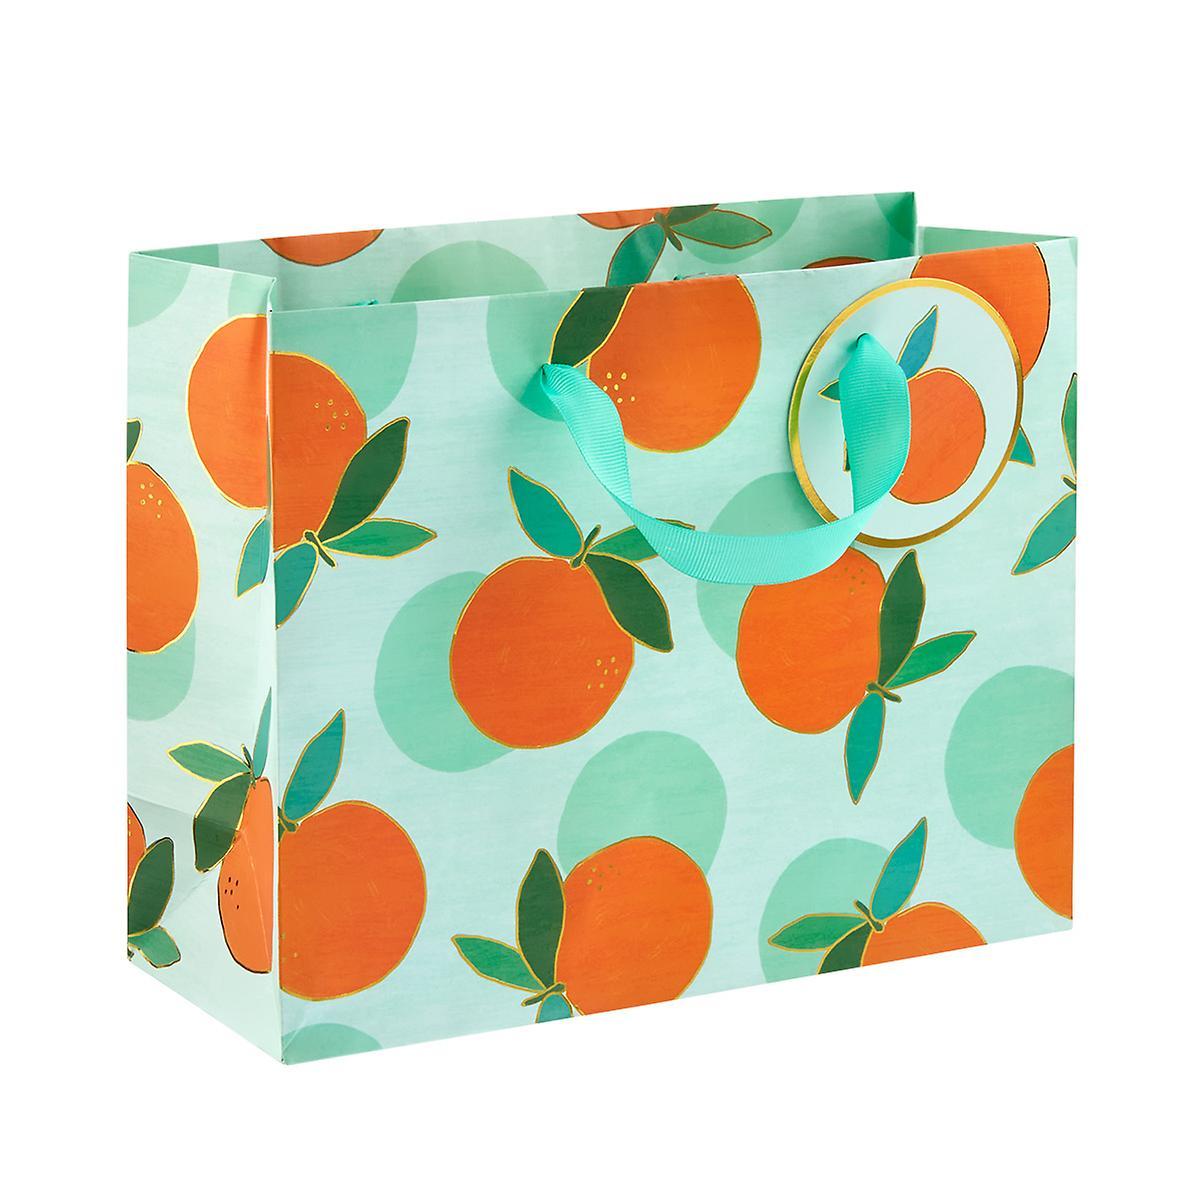 Medium Orange Crush Mint Gift Bag